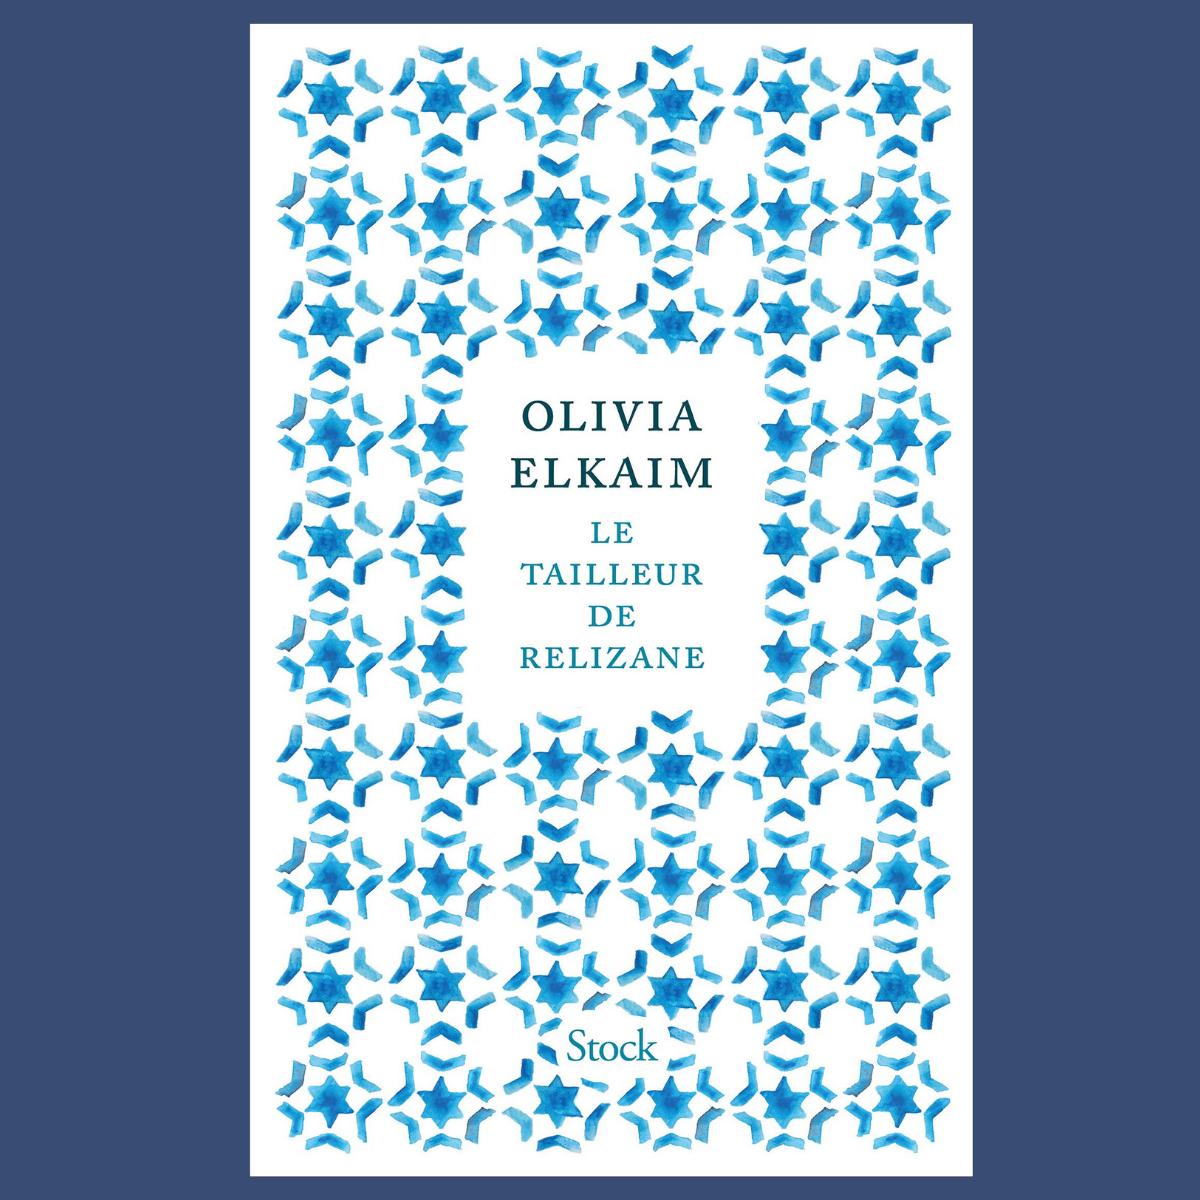 Le Tailleur de Relizane - Olivia Elkaim (Stock)